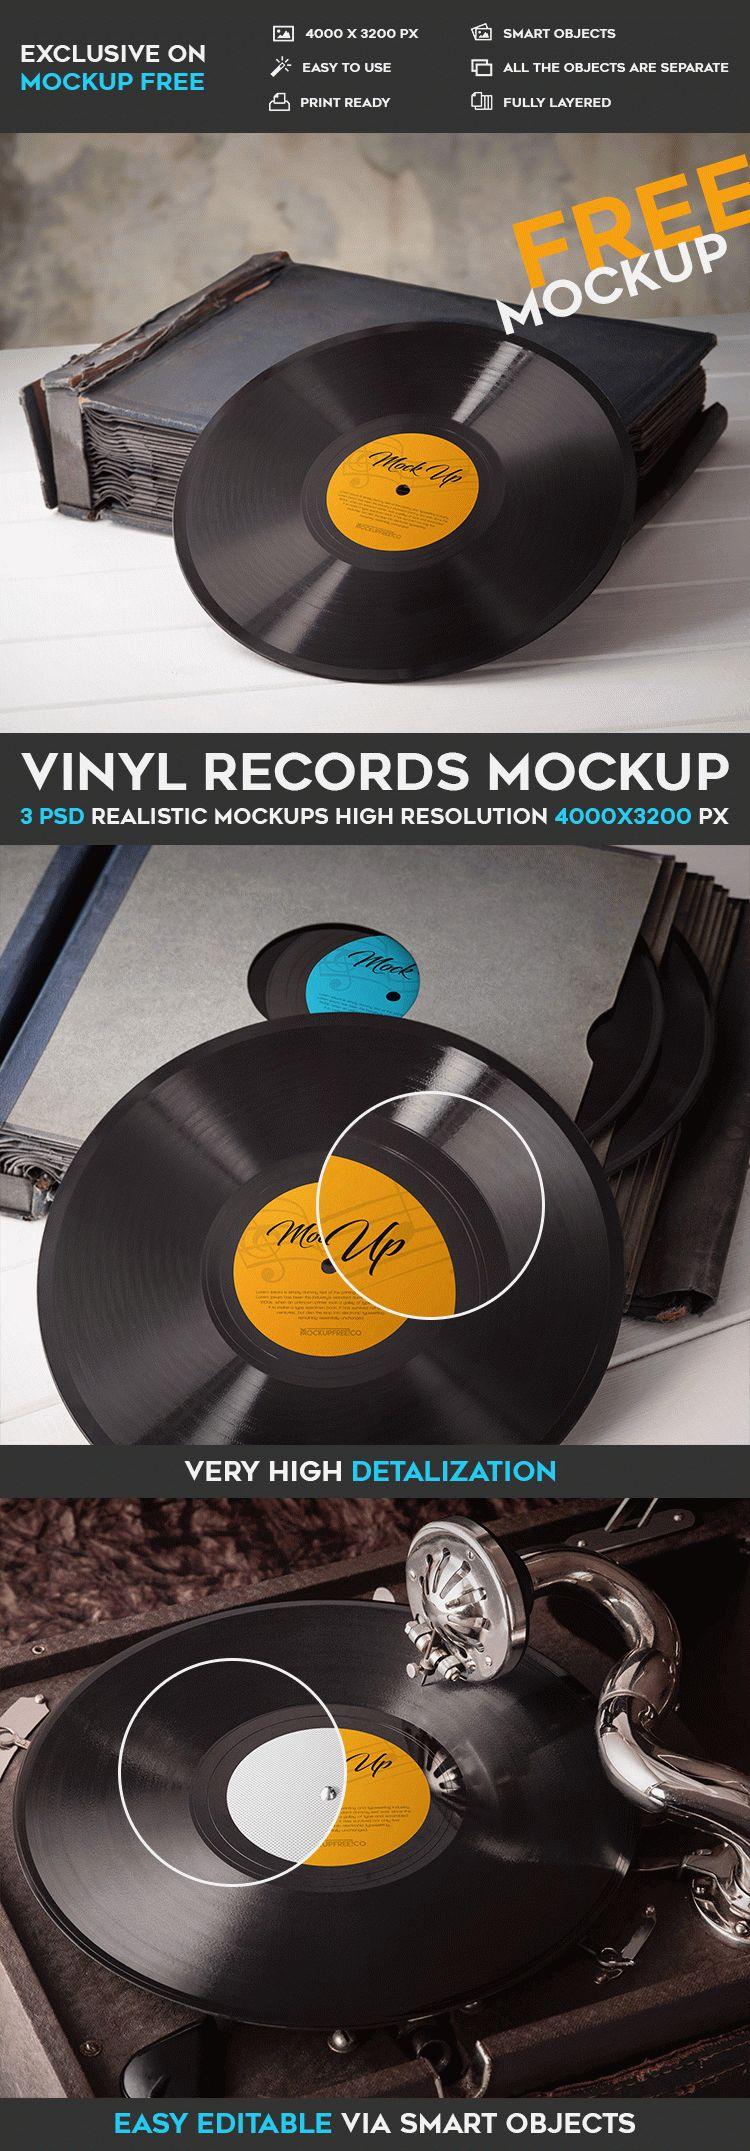 Vinyl Records – 3 Free PSD Mockups